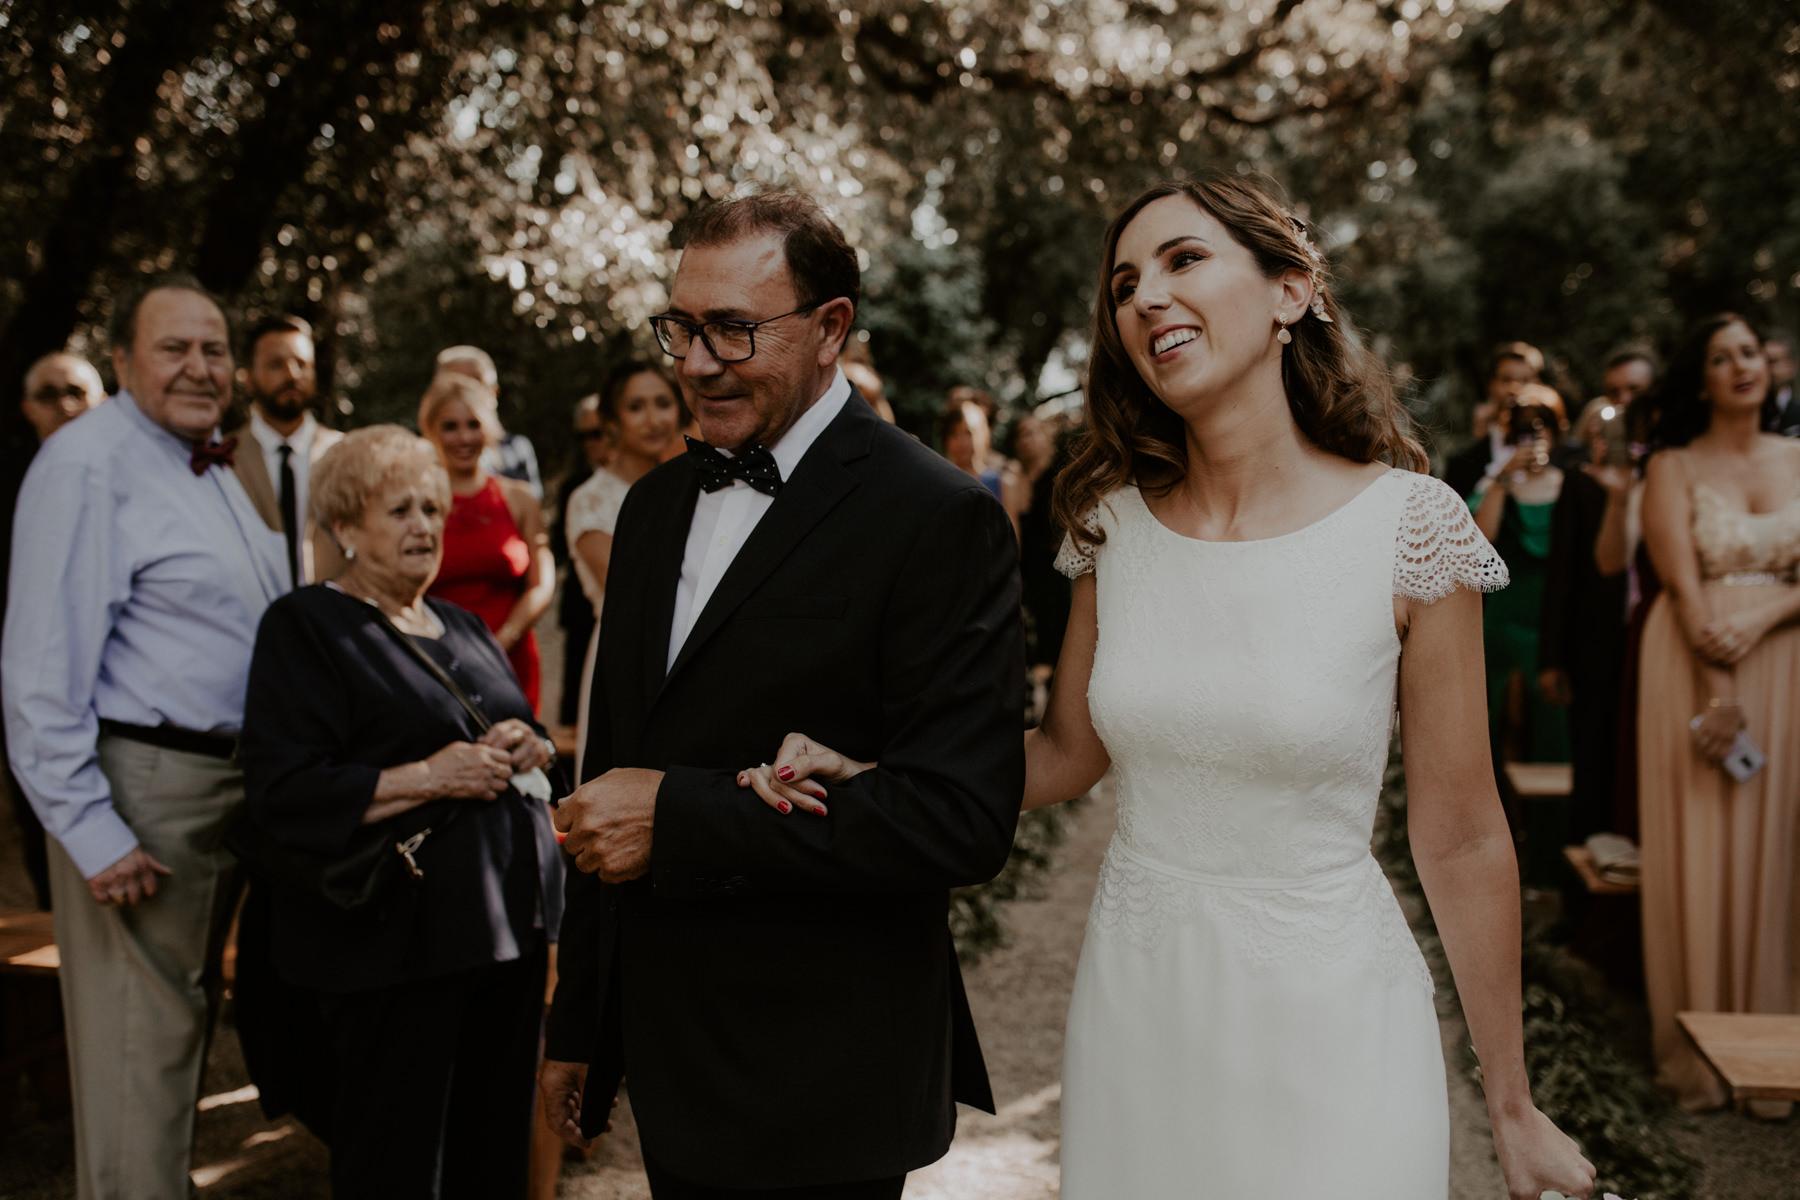 alt_thenortherngirlphotography_couples_weddingphotographer_photographer_wedding_boda_fotografodebodas_fotografobodasbarcelona_bodaindie_bodasconestilo_bodaensantperedeclara_jennifermiguel-293.jpg